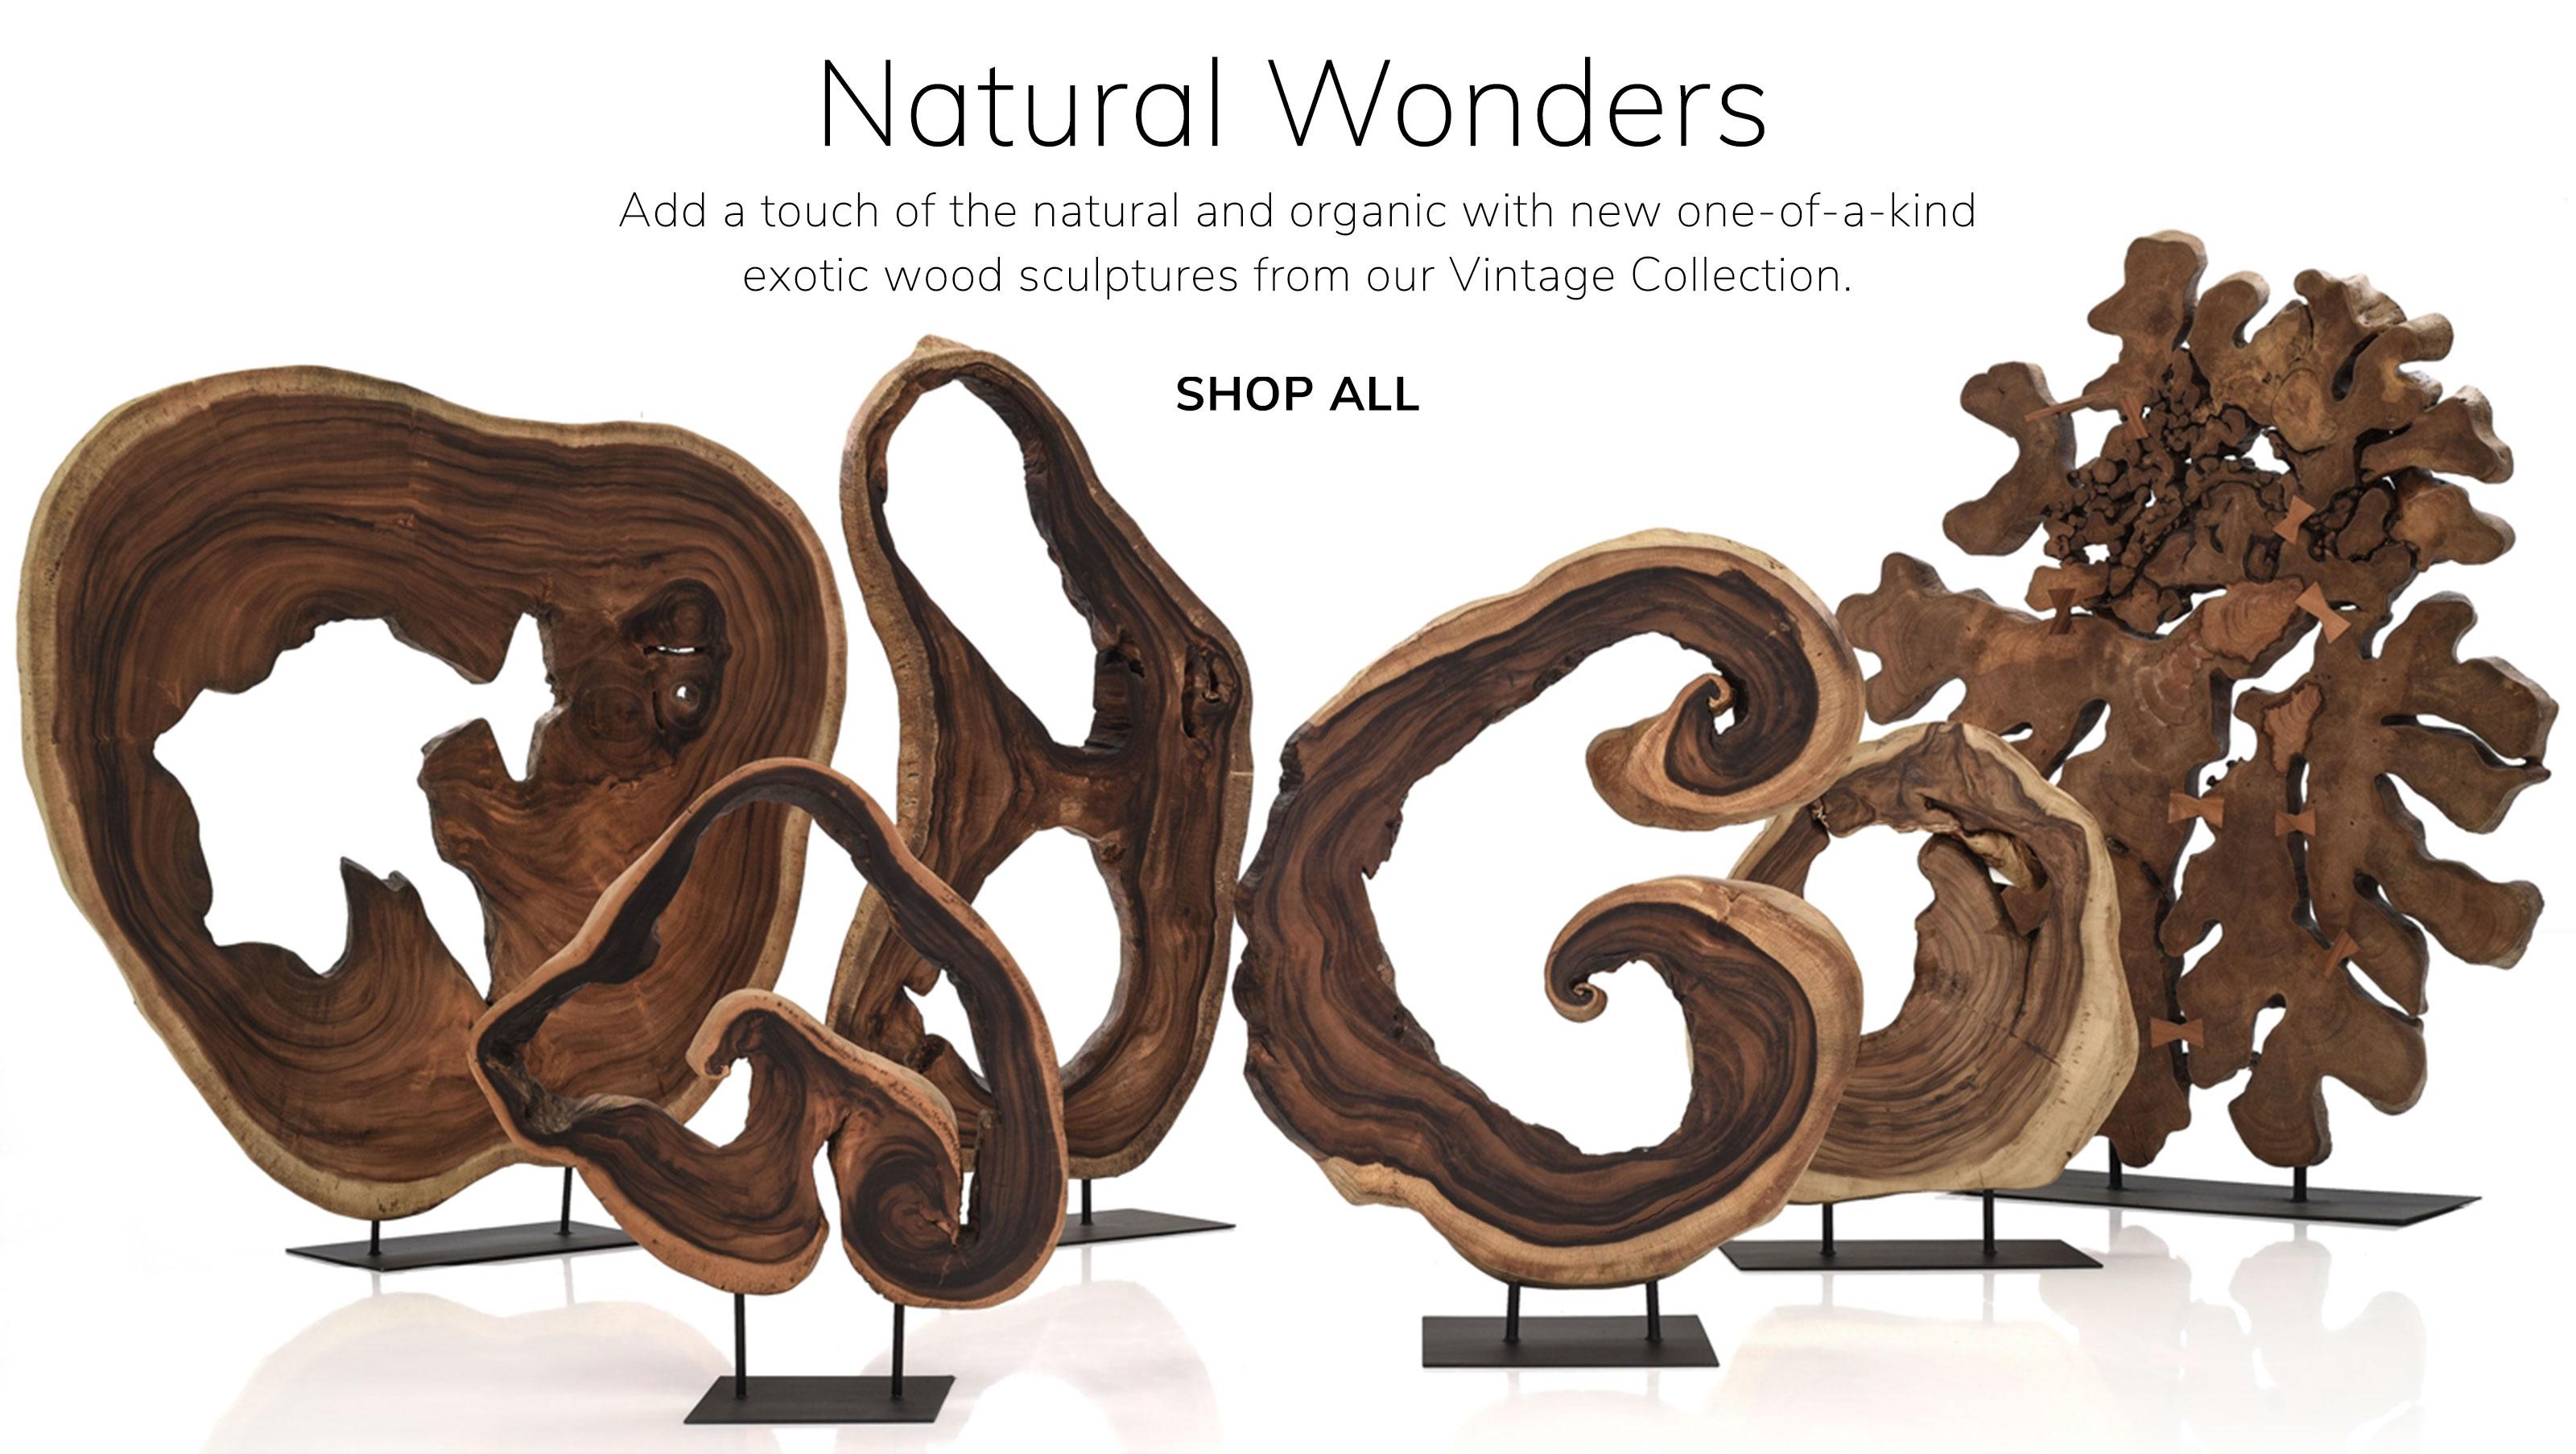 casa italy sofa singapore u17 sofascore modern furniture contemporary cantoni vintage sculpture collection